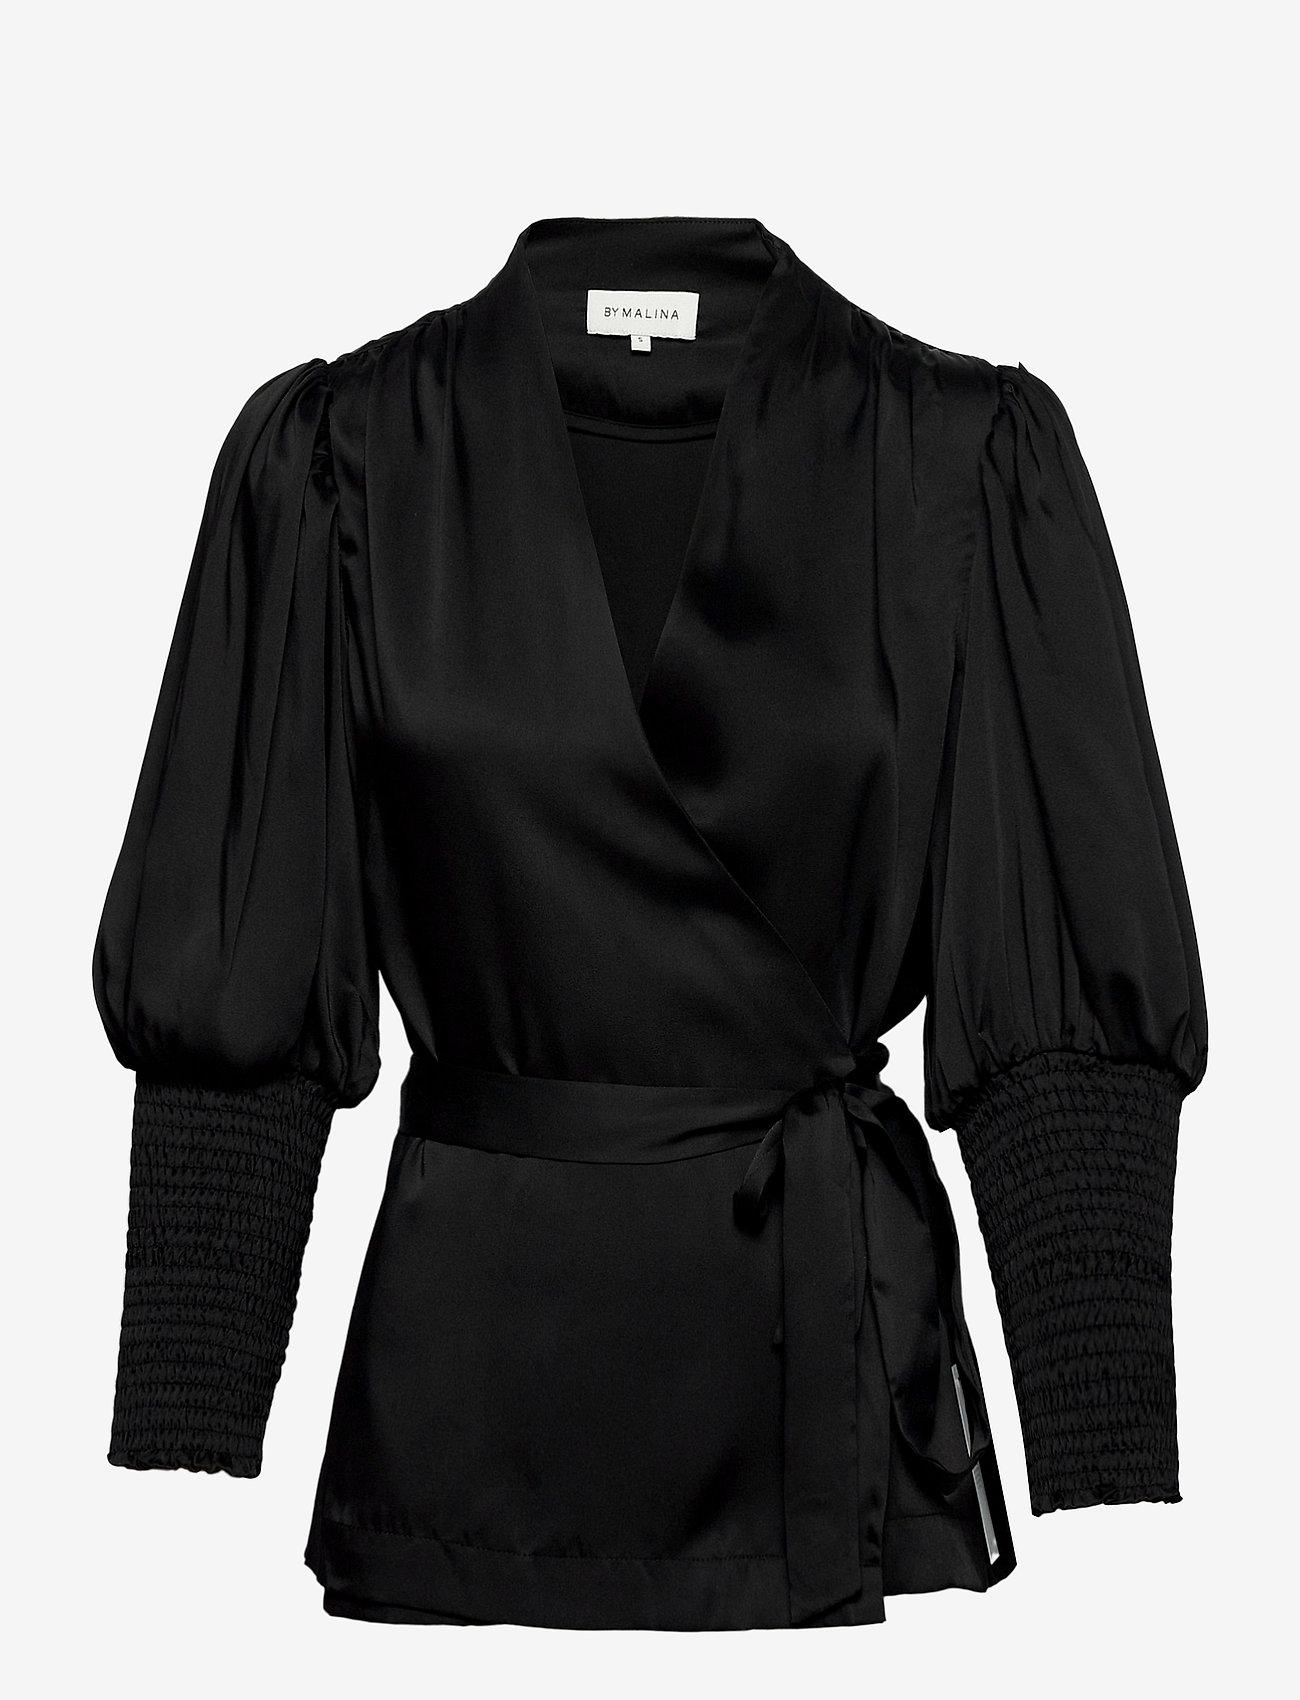 By Malina - Hope blouse - långärmade blusar - black - 1